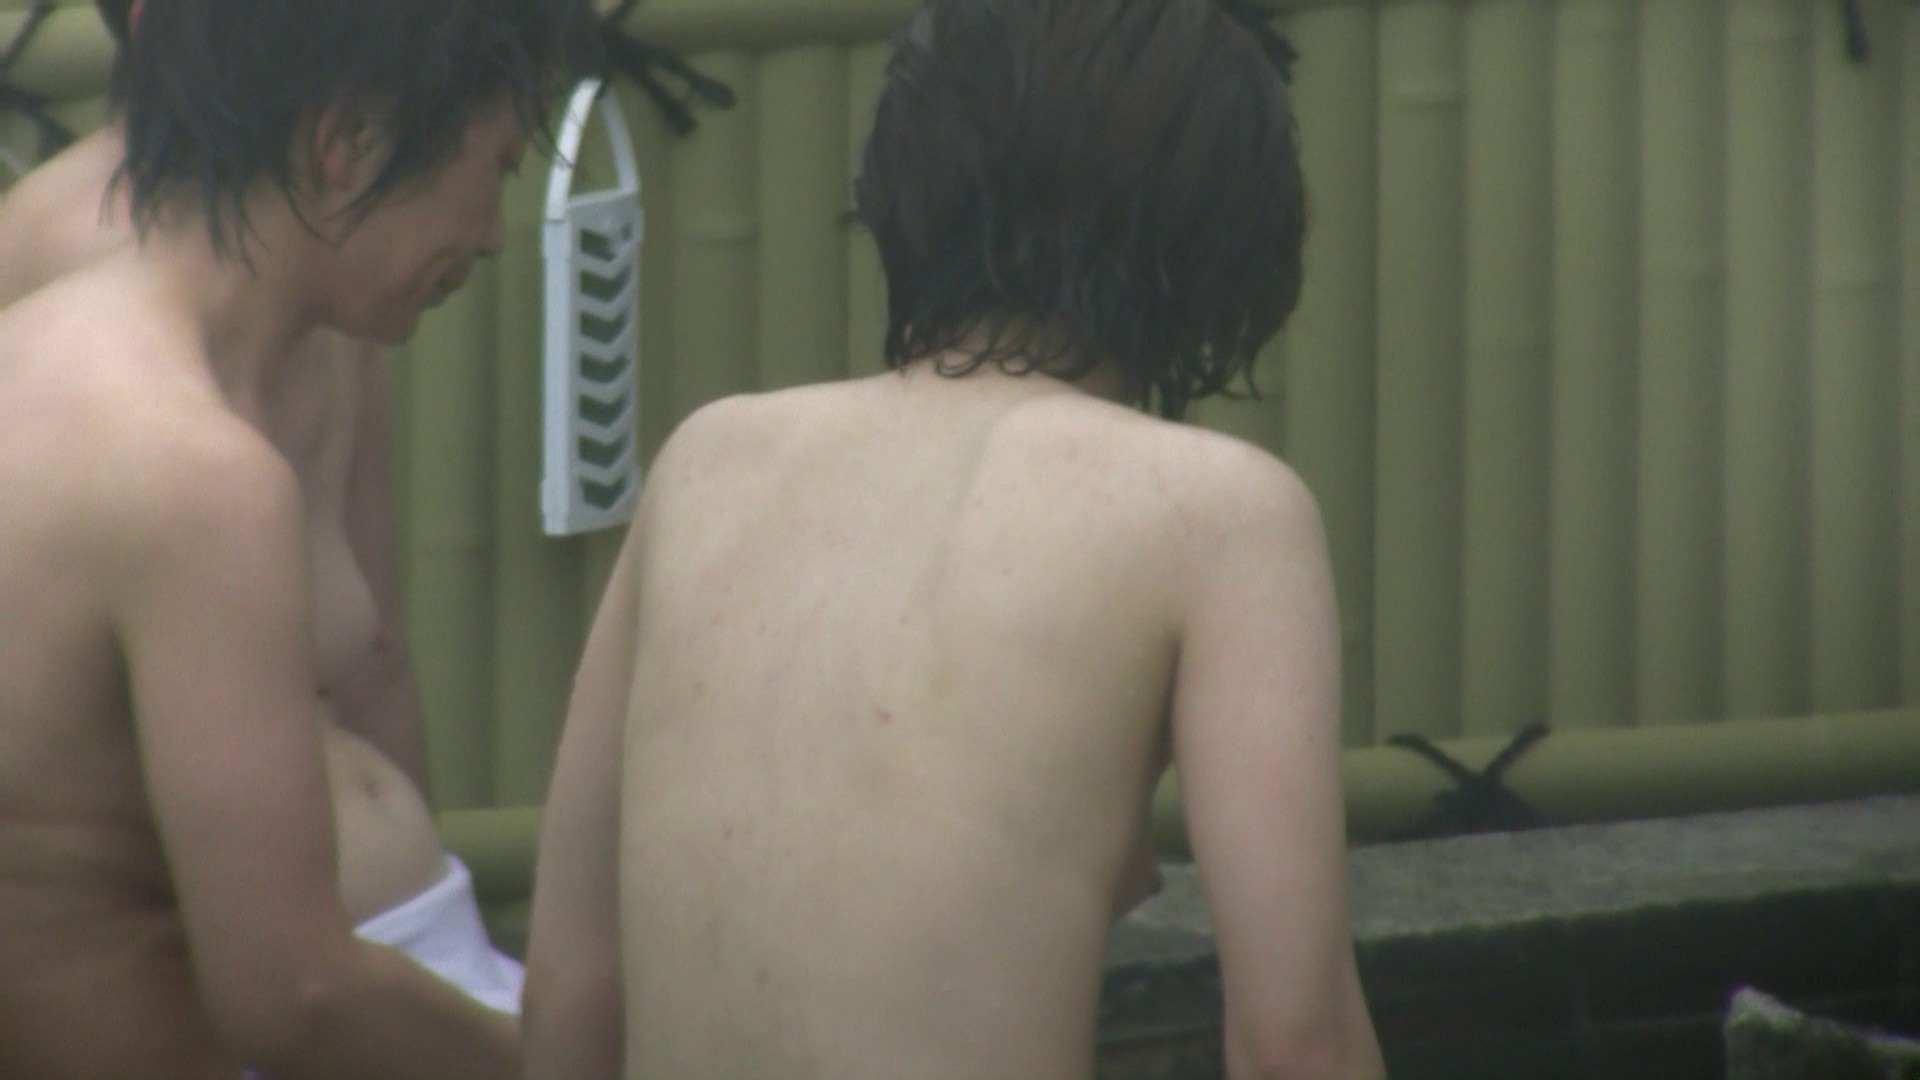 Aquaな露天風呂Vol.584 露天風呂突入 盗撮動画紹介 75pic 20